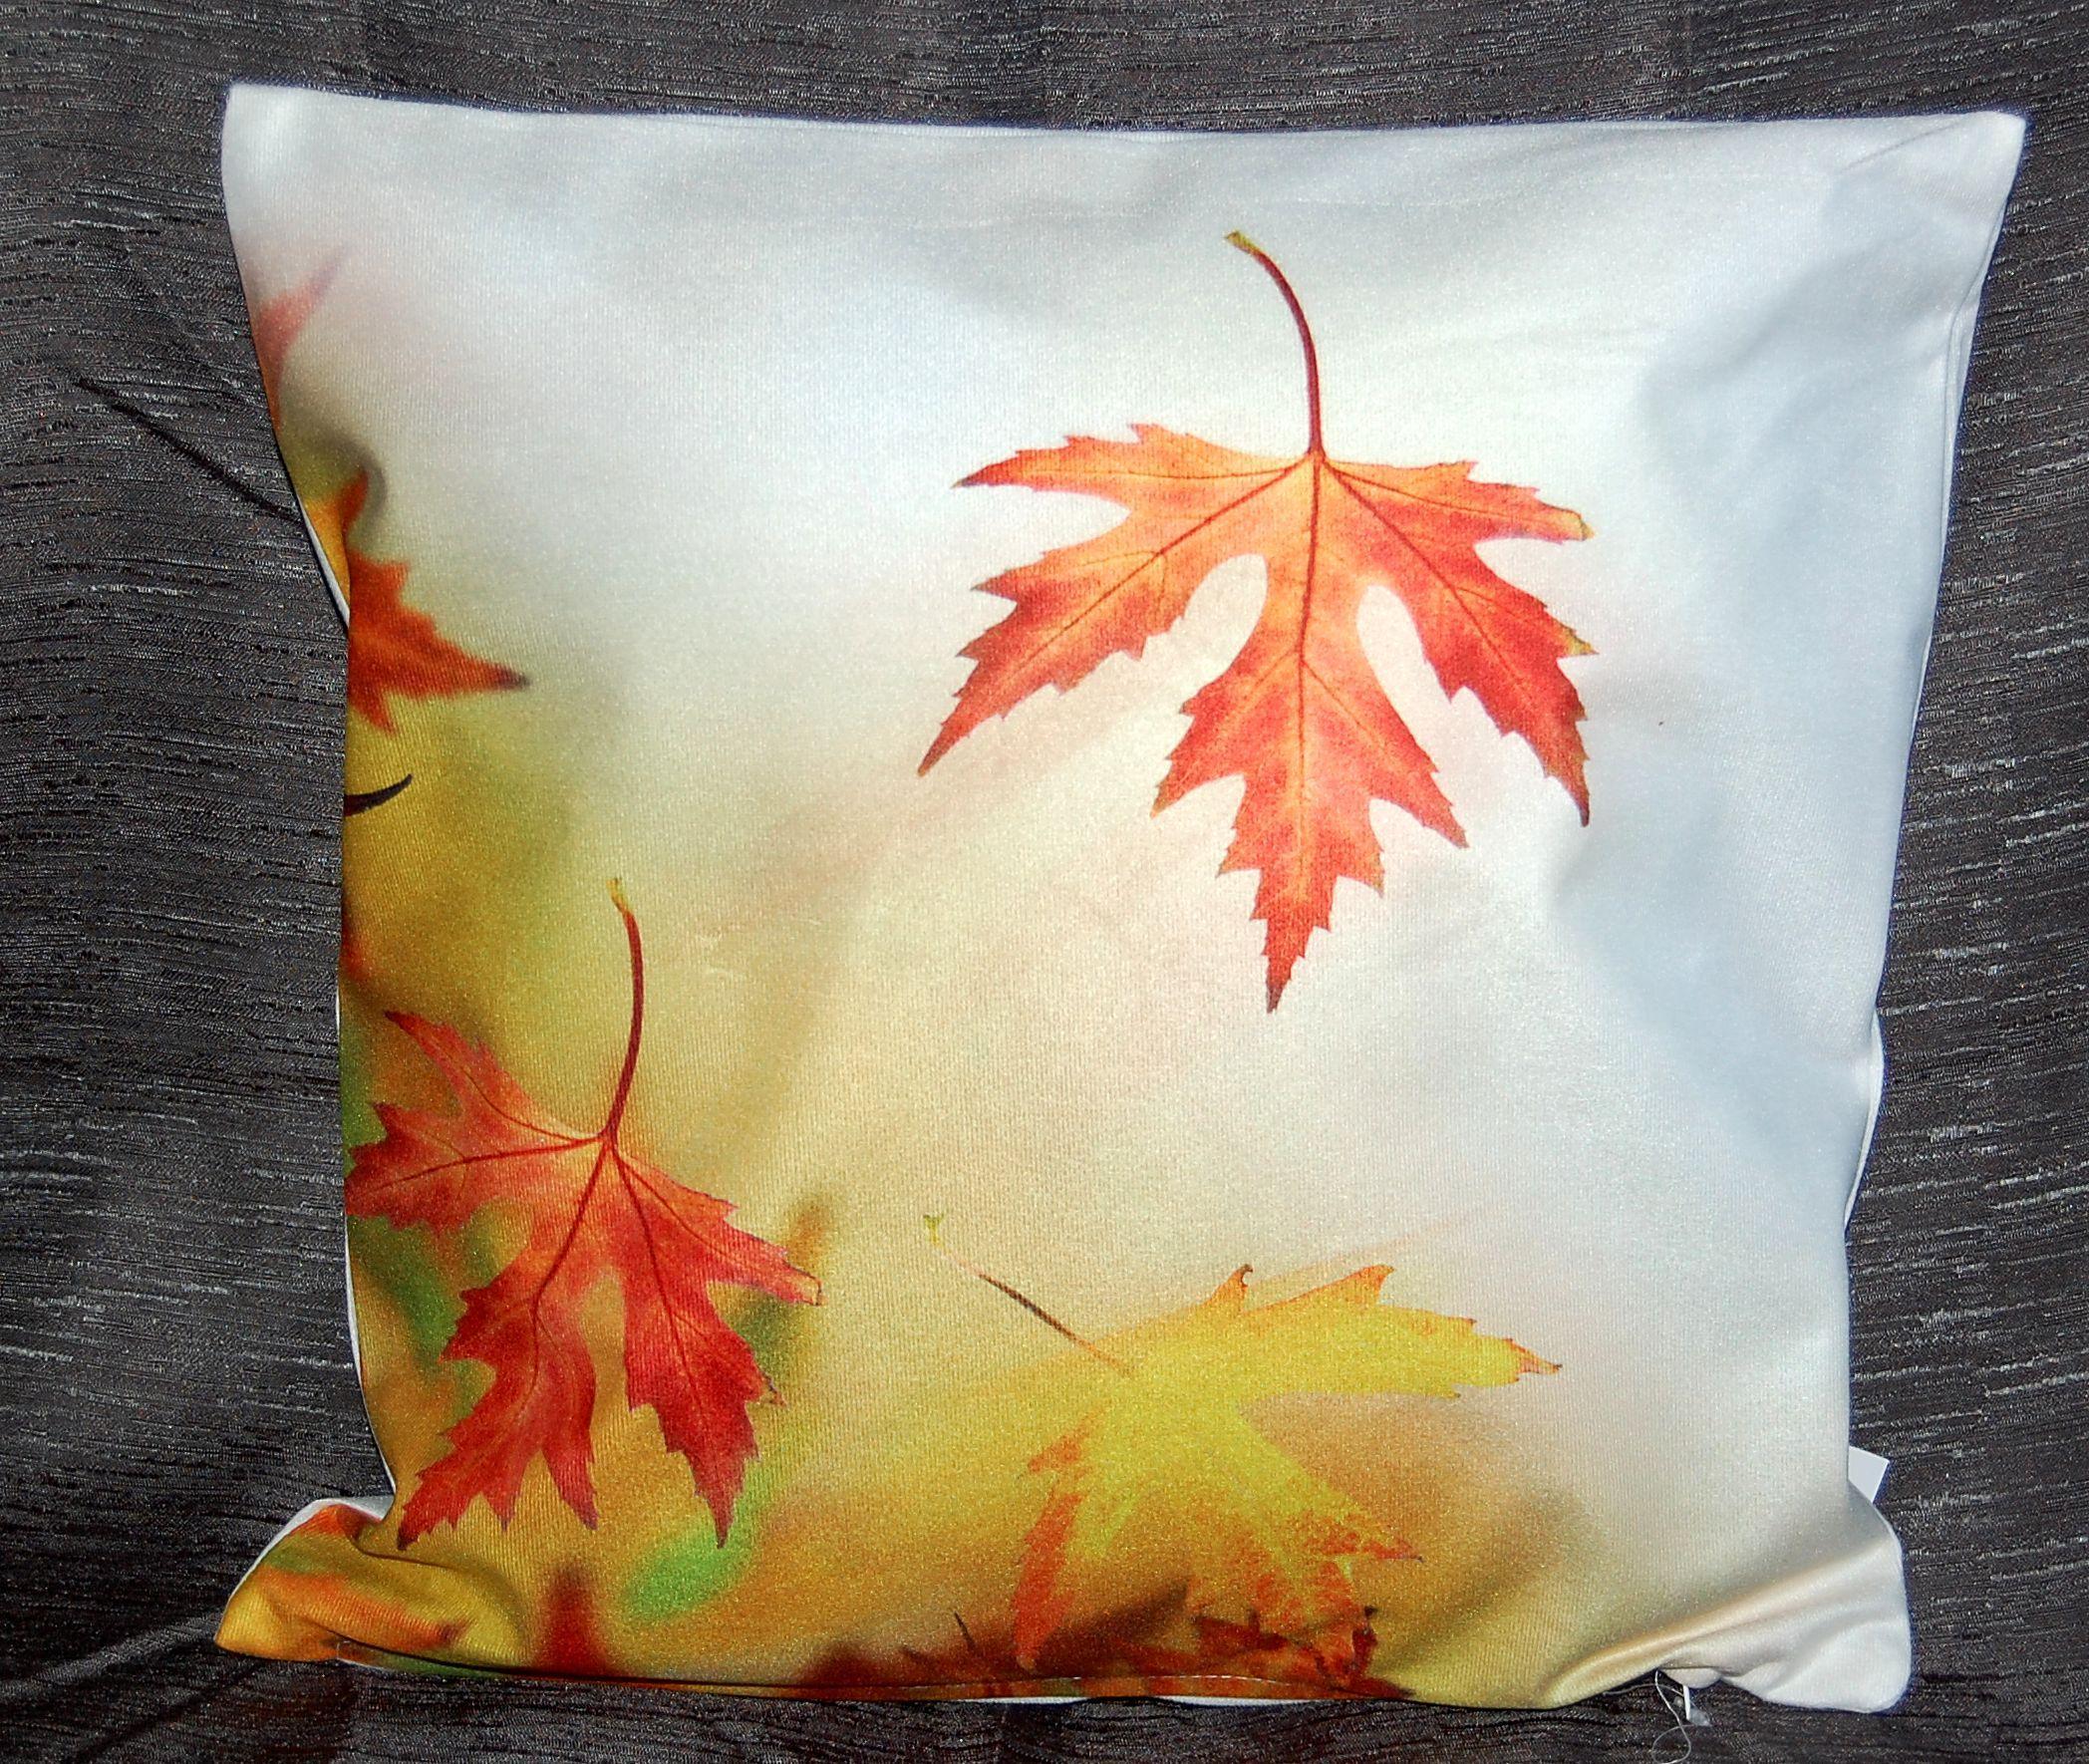 kissenh lle 40x40 cm kissenbezug foto herbst sofakissen kissen bl tter sunflower ebay. Black Bedroom Furniture Sets. Home Design Ideas